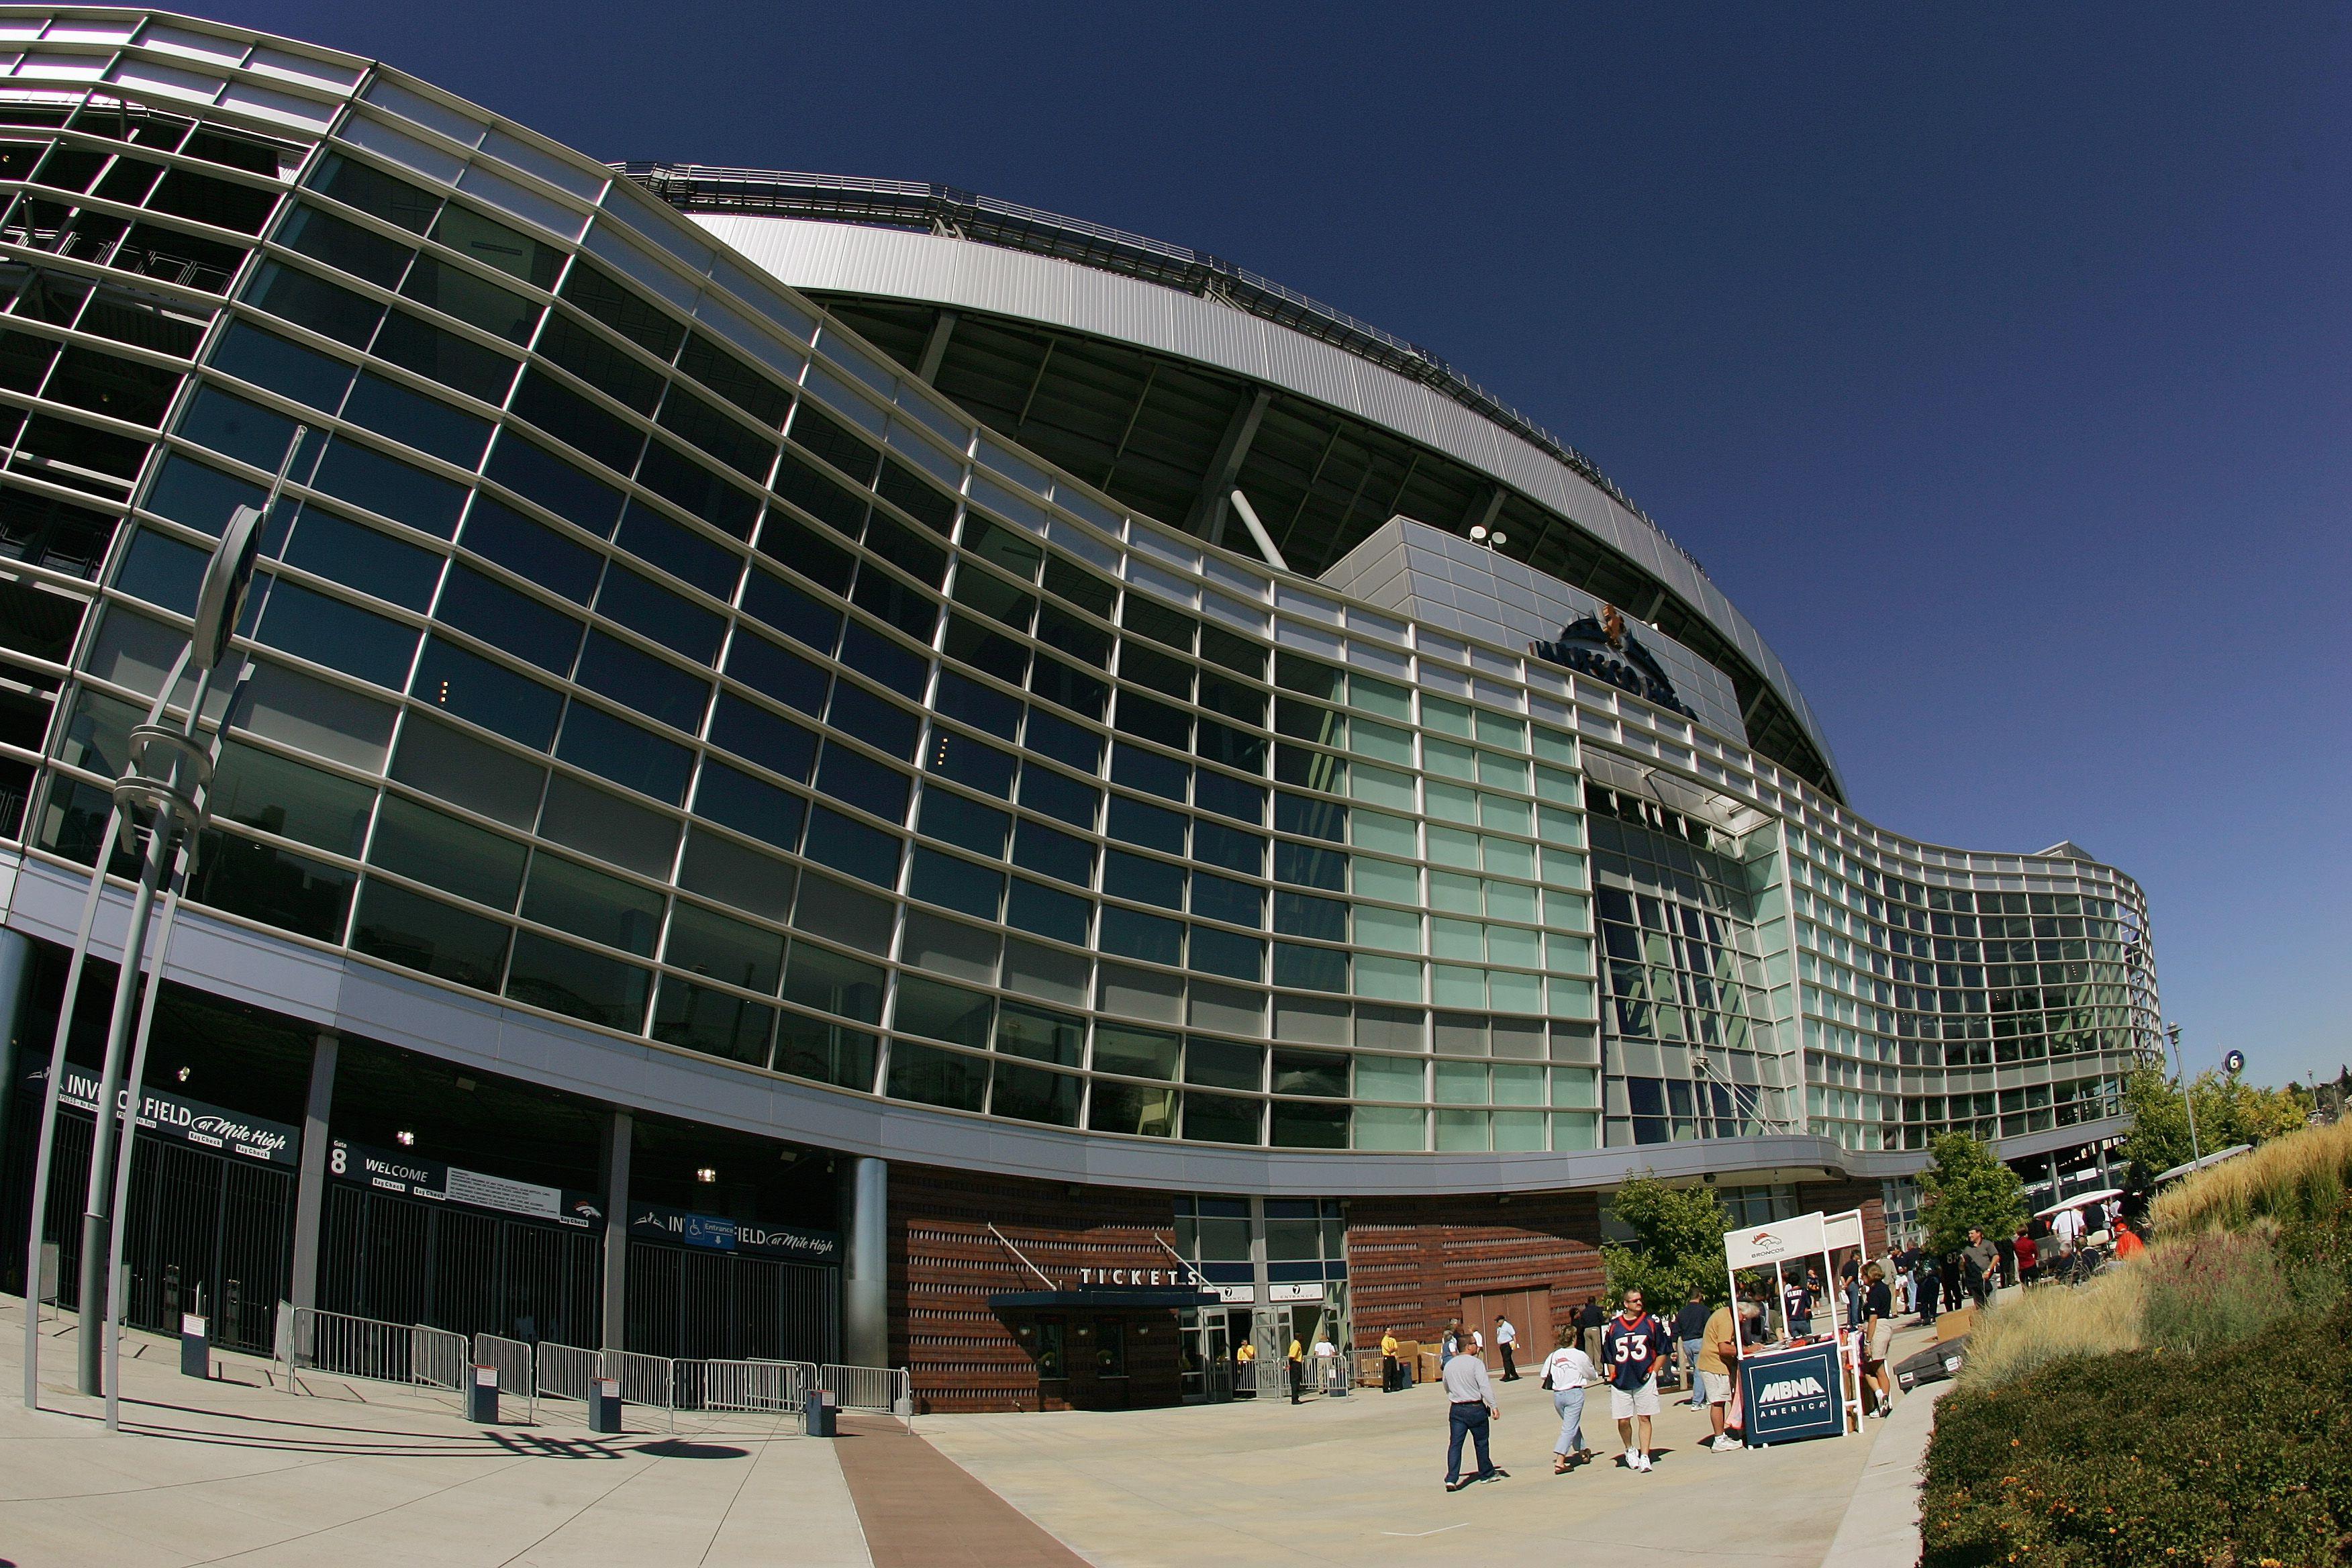 Denver Broncos' Stadium, INVESCO Field at Mile High, in Denver, Colorado